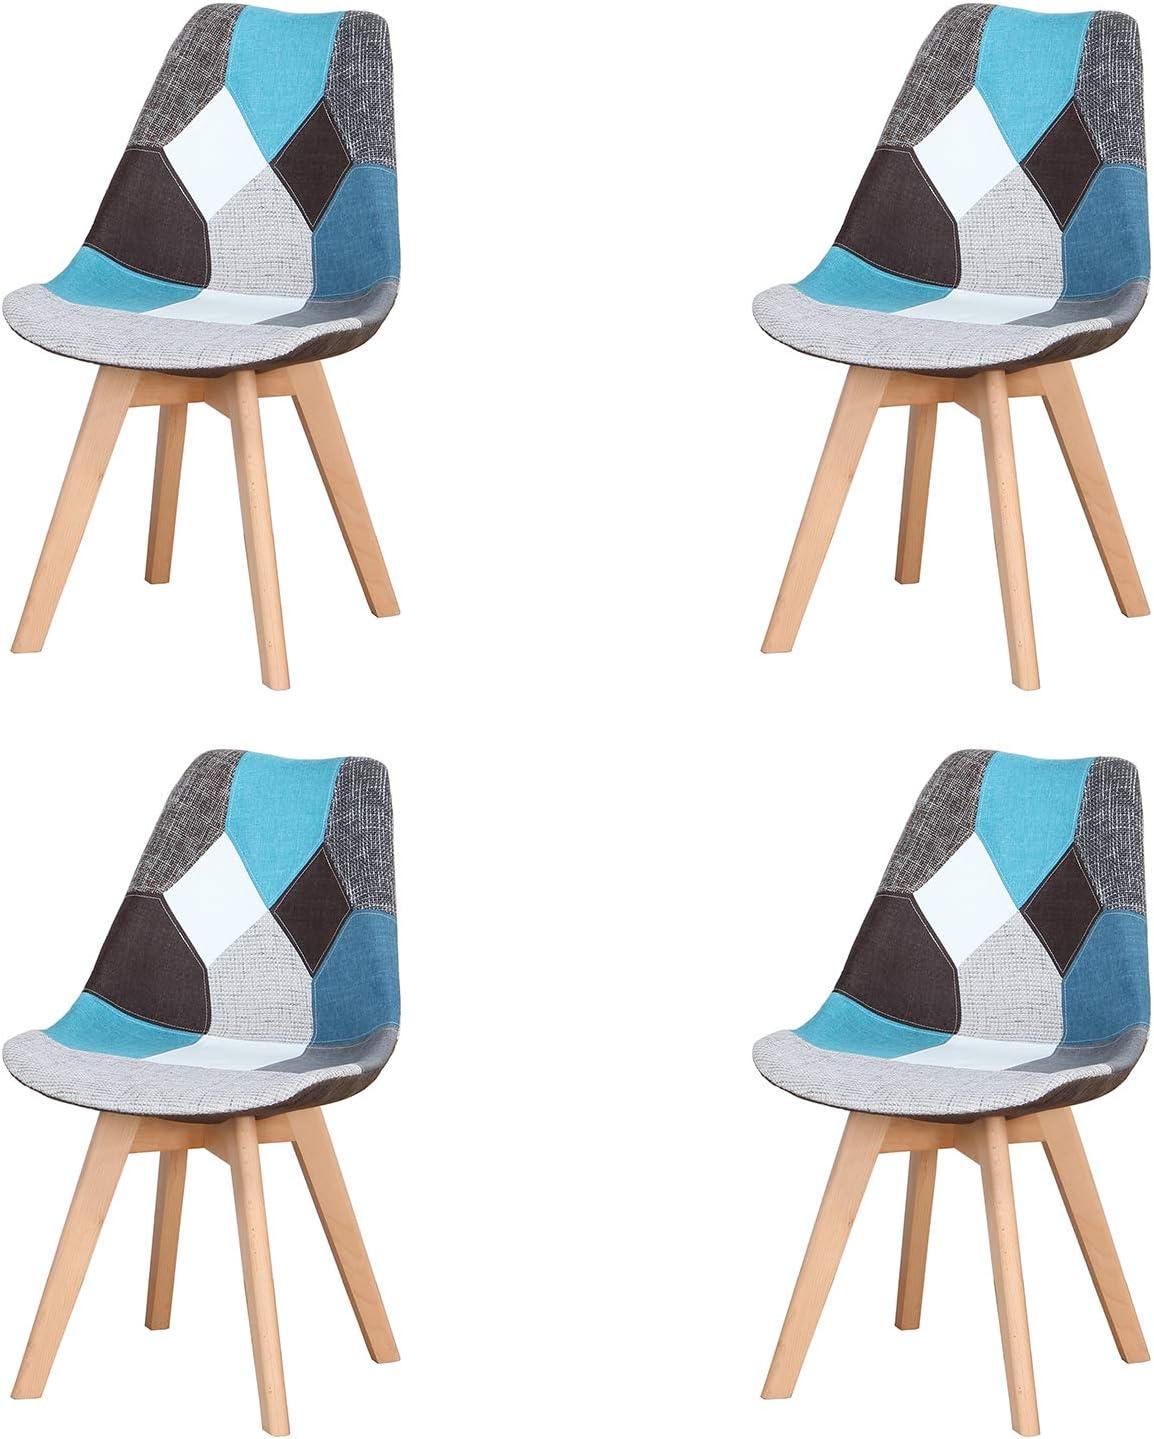 Injoy Life - Juego de 4 sillas de comedor modernas con patas de madera maciza y asiento acolchado suave para cocina, salón, oficina, color azul